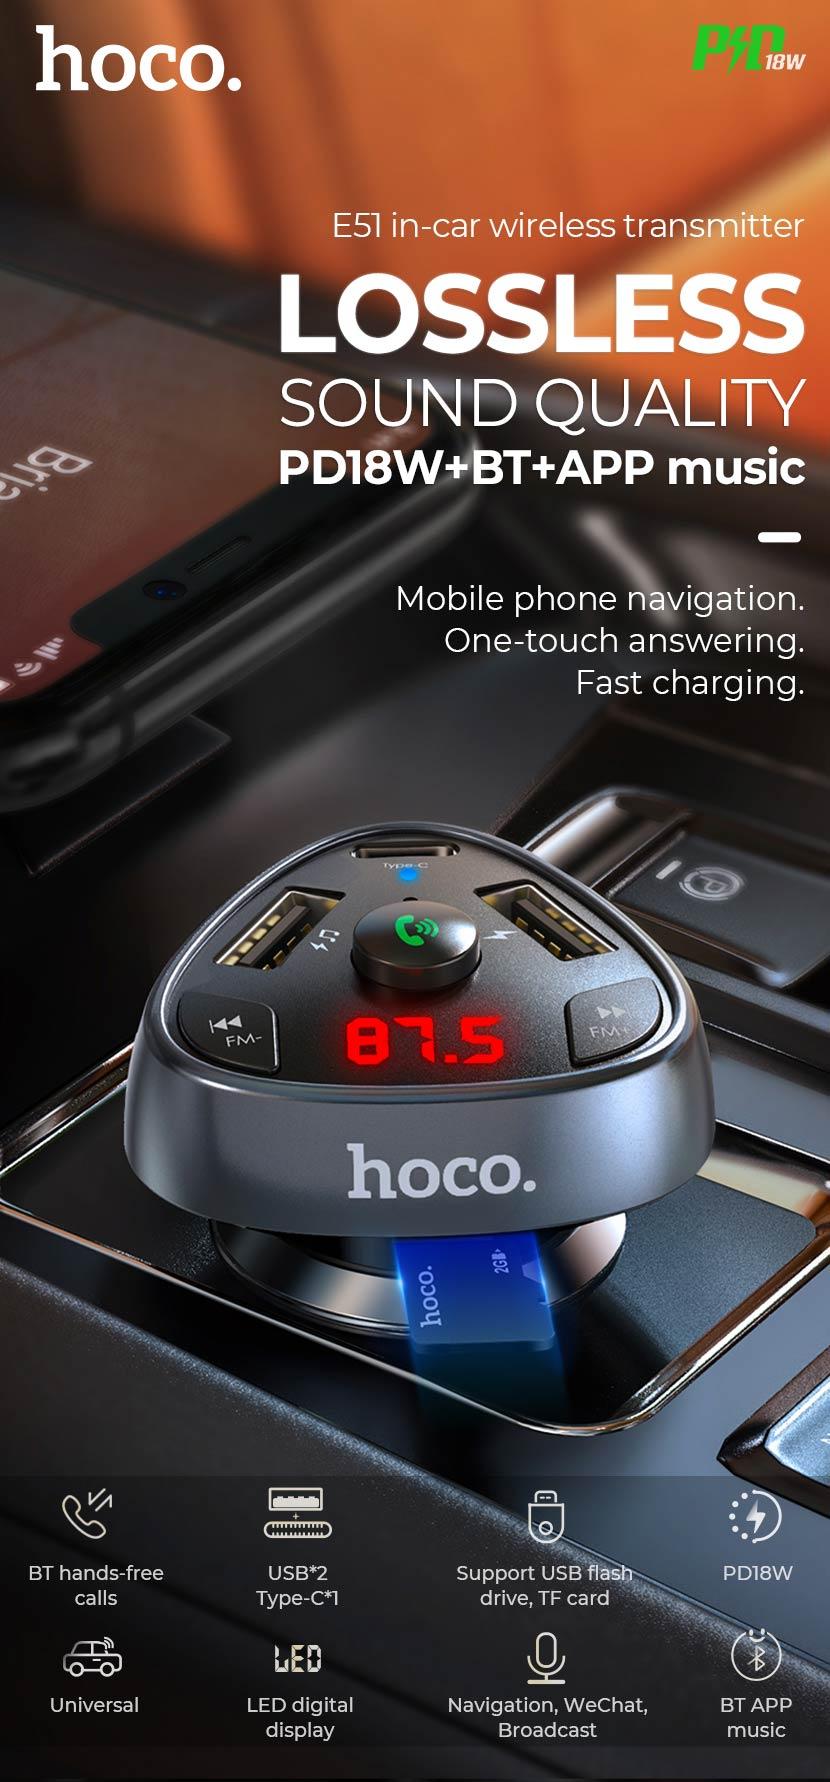 hoco news e51 road treasure in car bt fm transmitter sound quality en